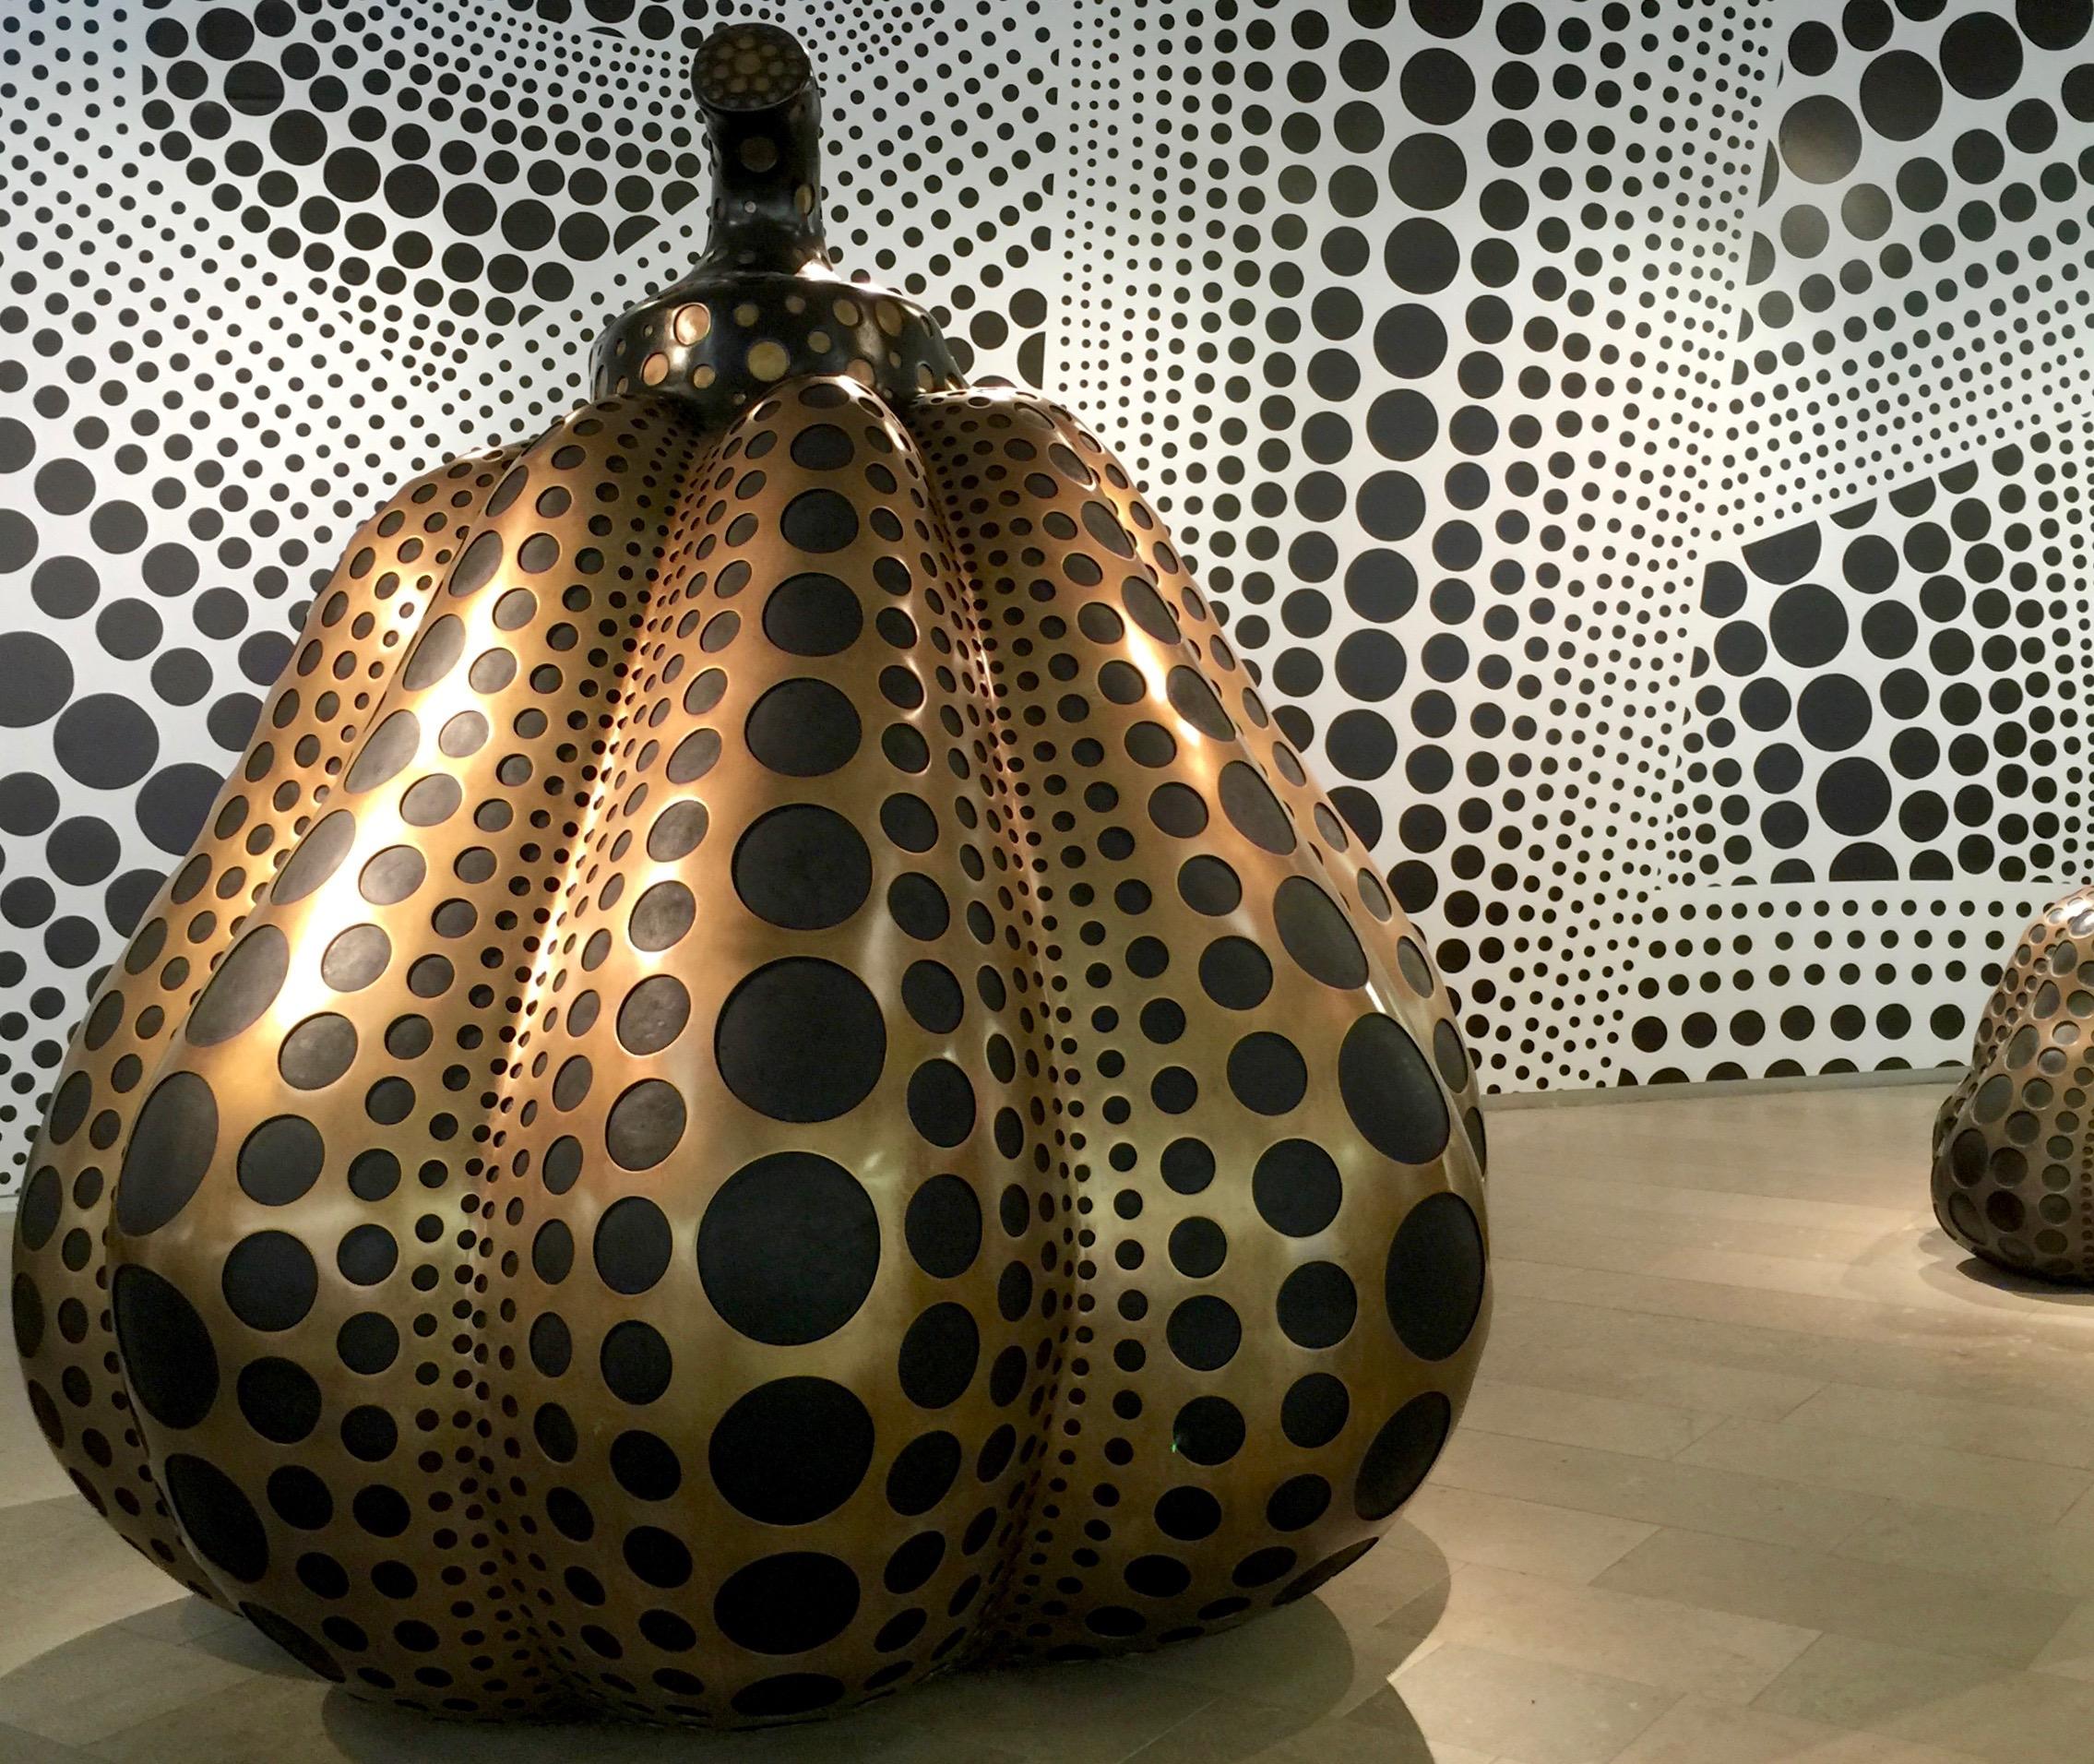 Yayoi Kunama exhibit at the Moderna Museet in Stockholm